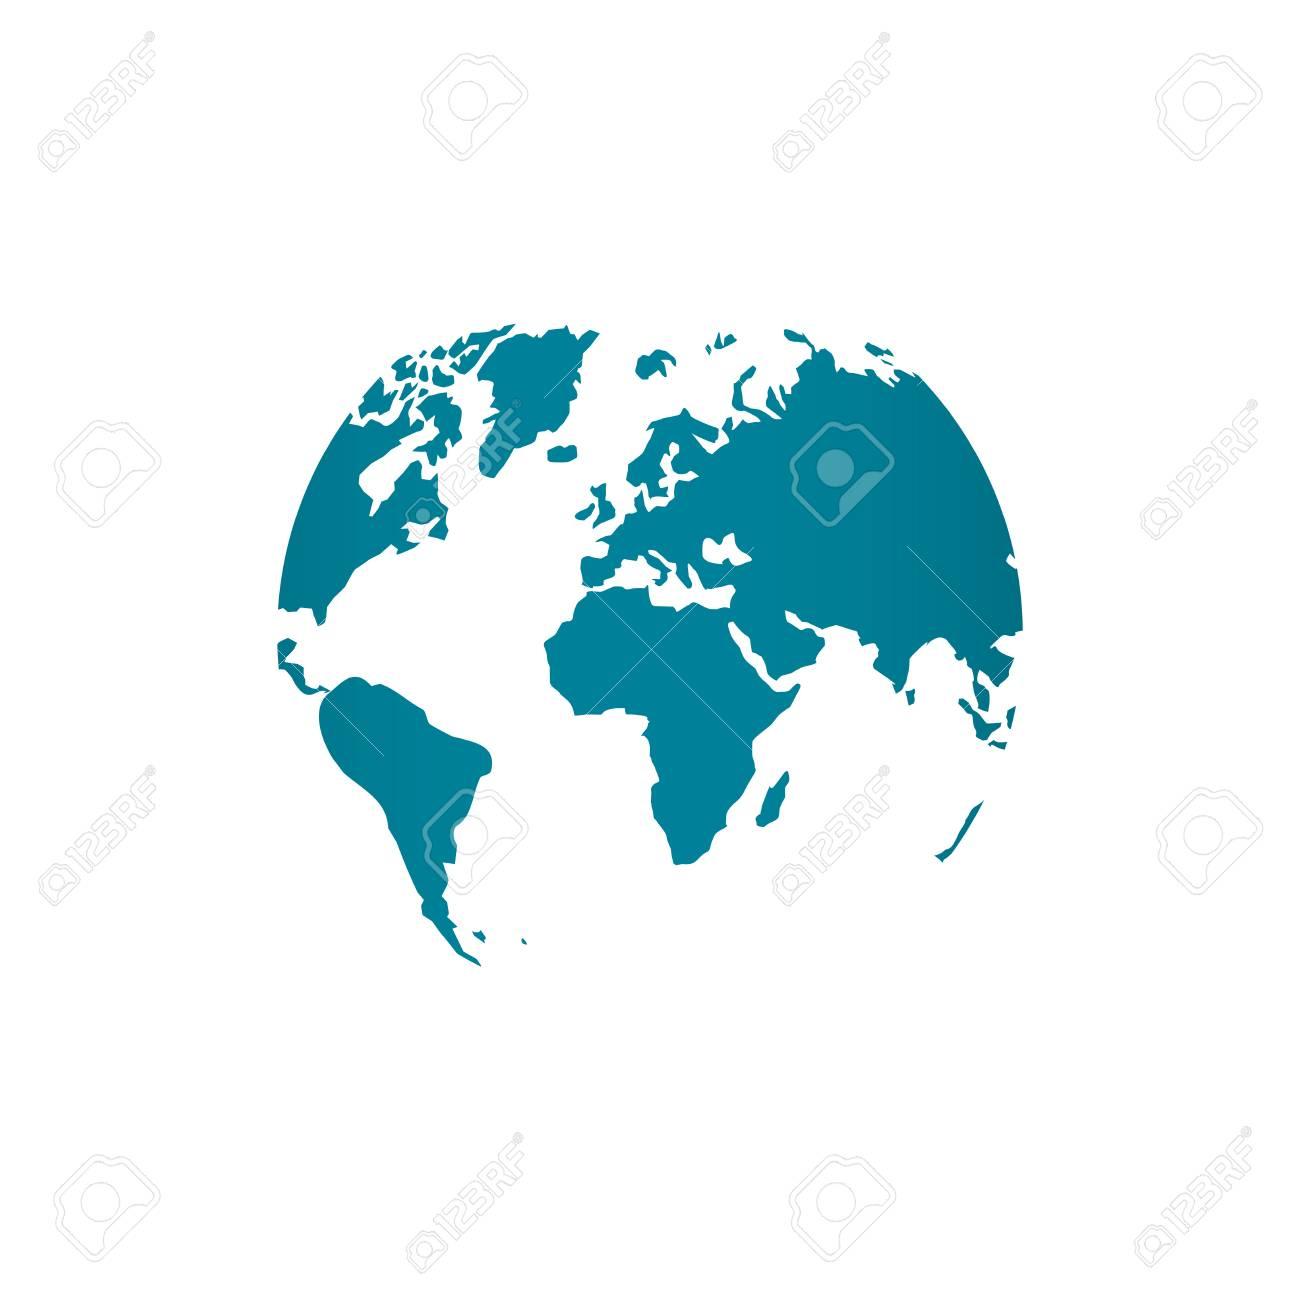 Blue world map globe vector illustration isolated on white blue world map globe vector illustration isolated on white background stylized in sphere shape stock vector gumiabroncs Gallery